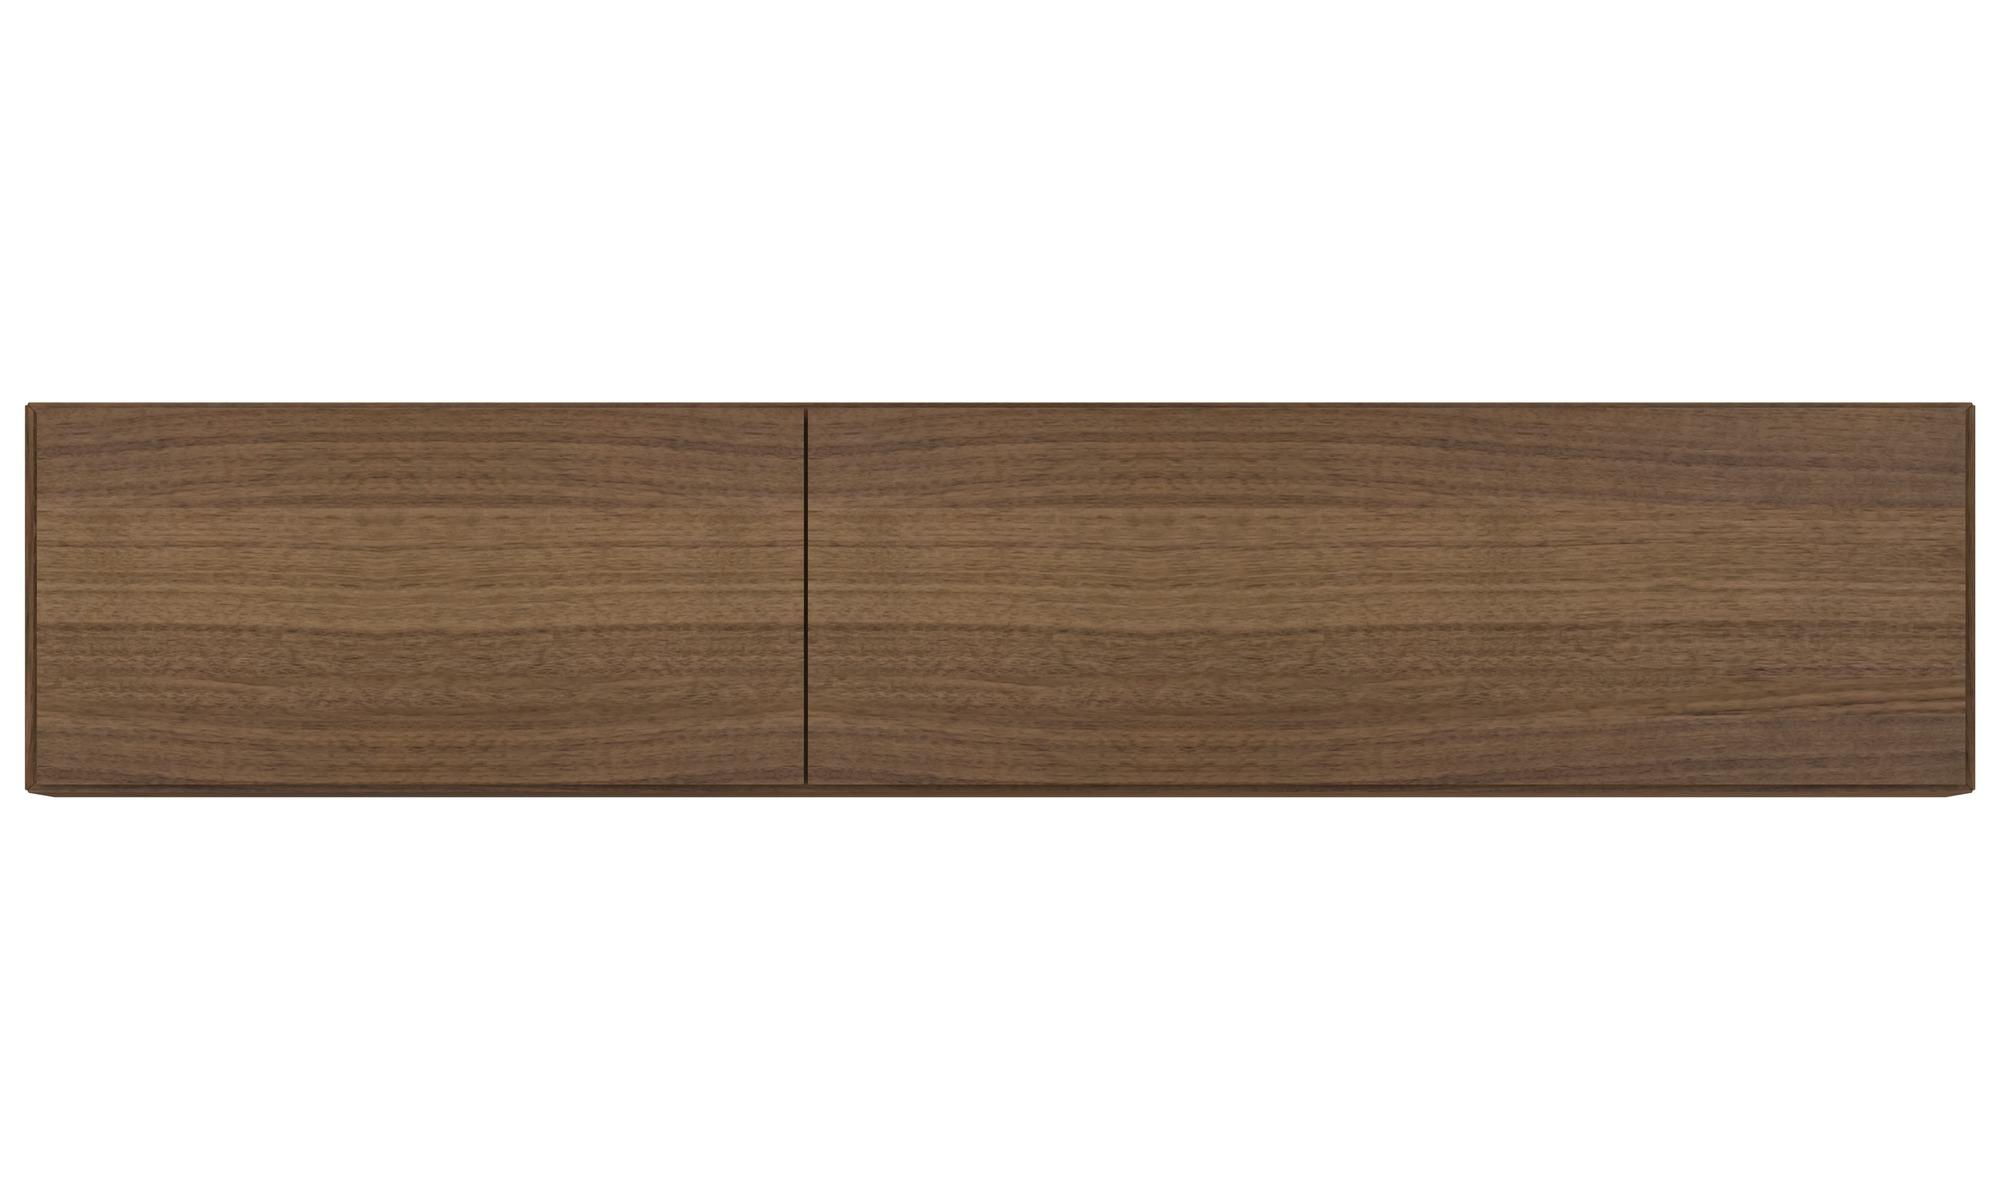 Murales meuble lugano avec fixation murale et portes for Fixer un meuble mural ikea